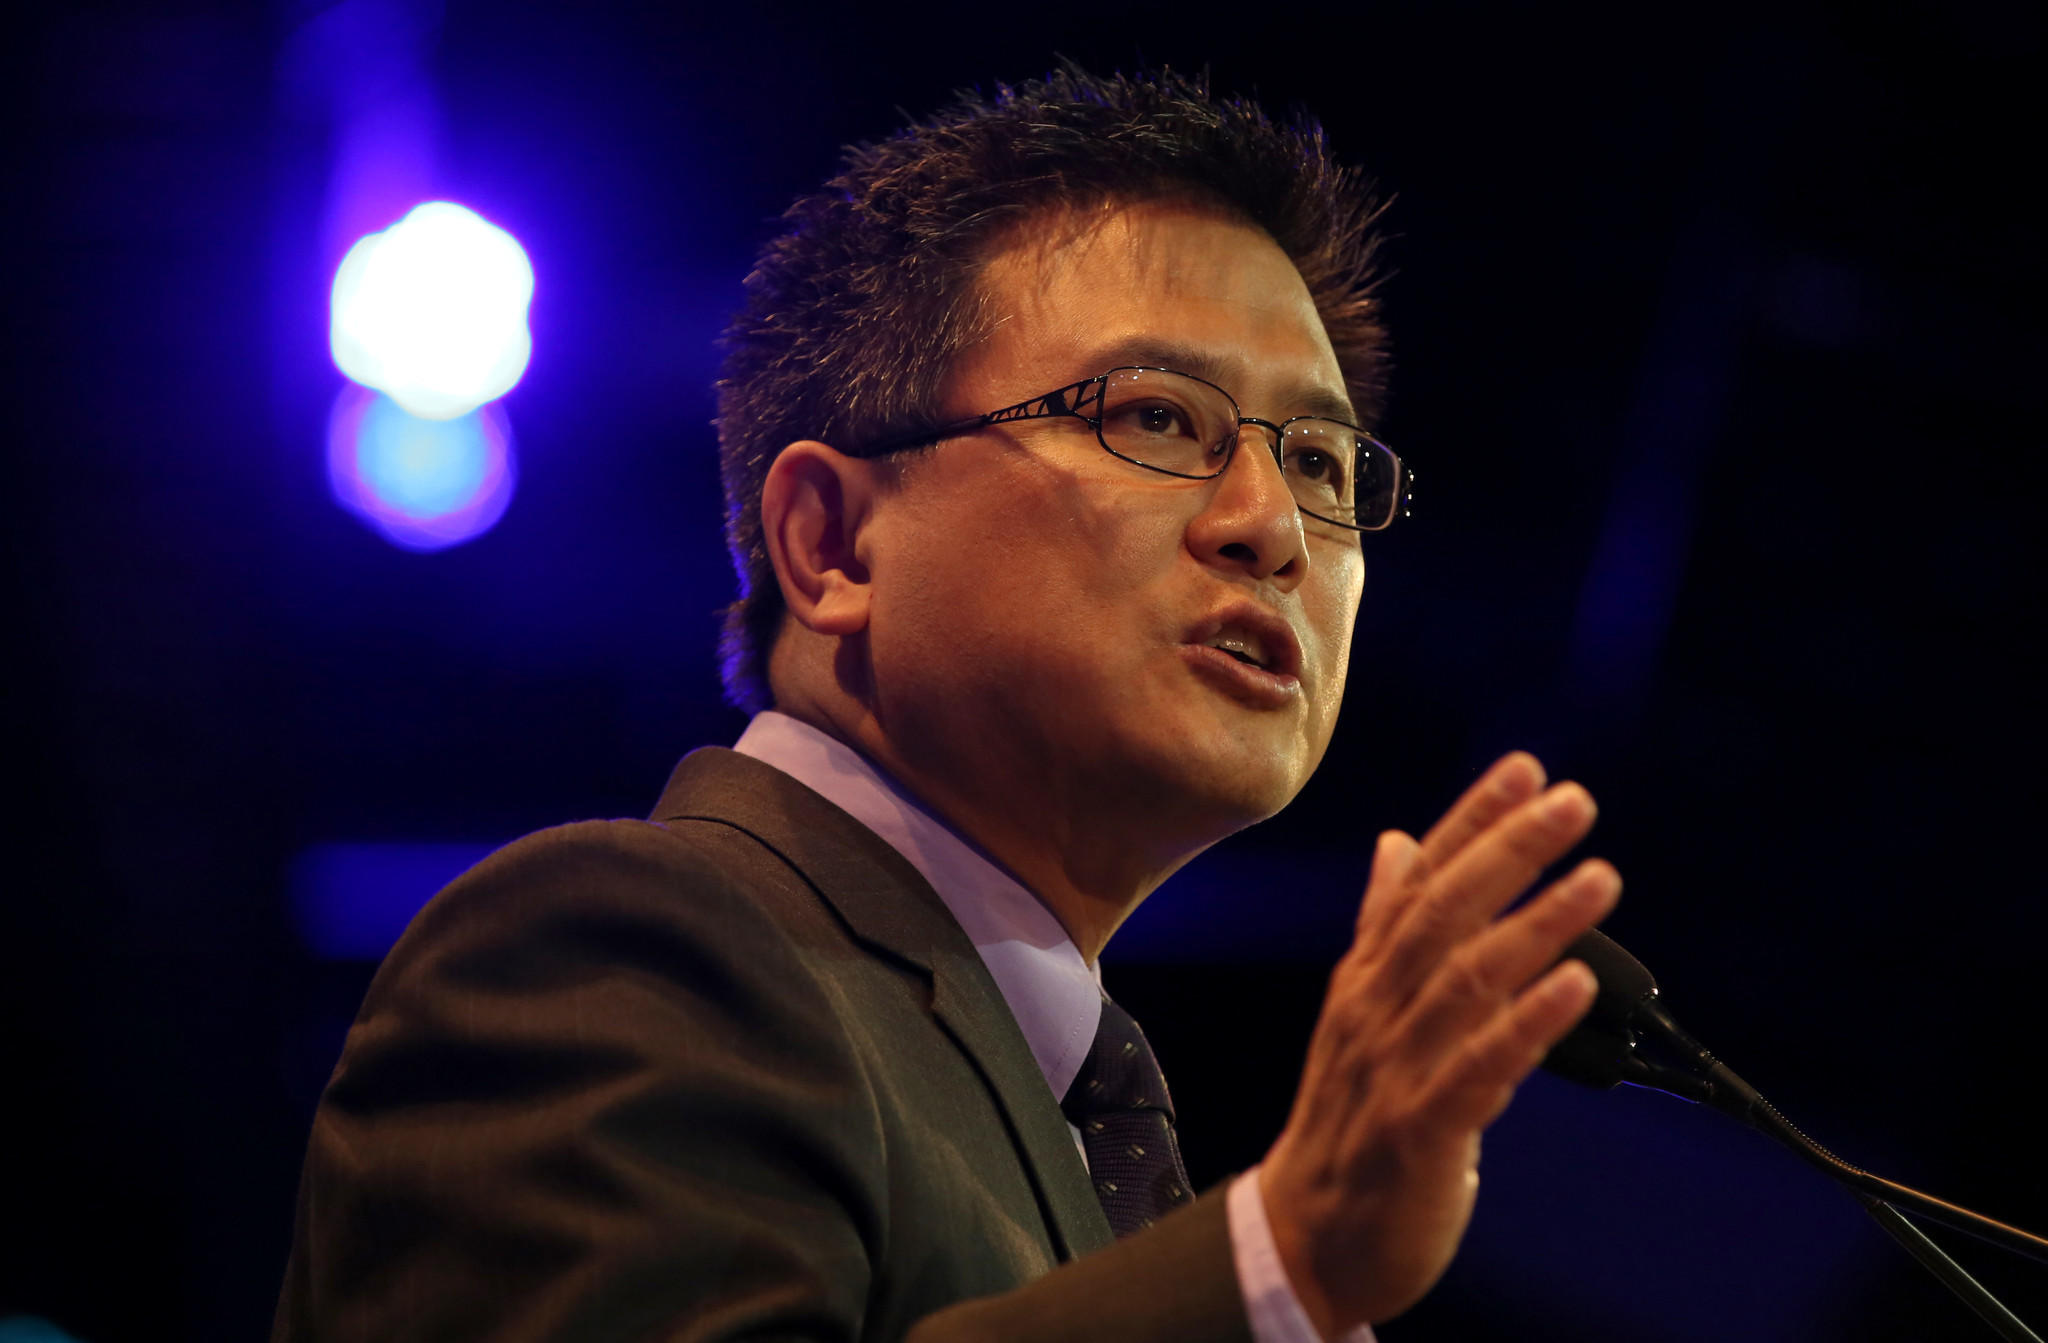 State Treasurer John Chiang (Irfan Kahn / Los Angeles Times)